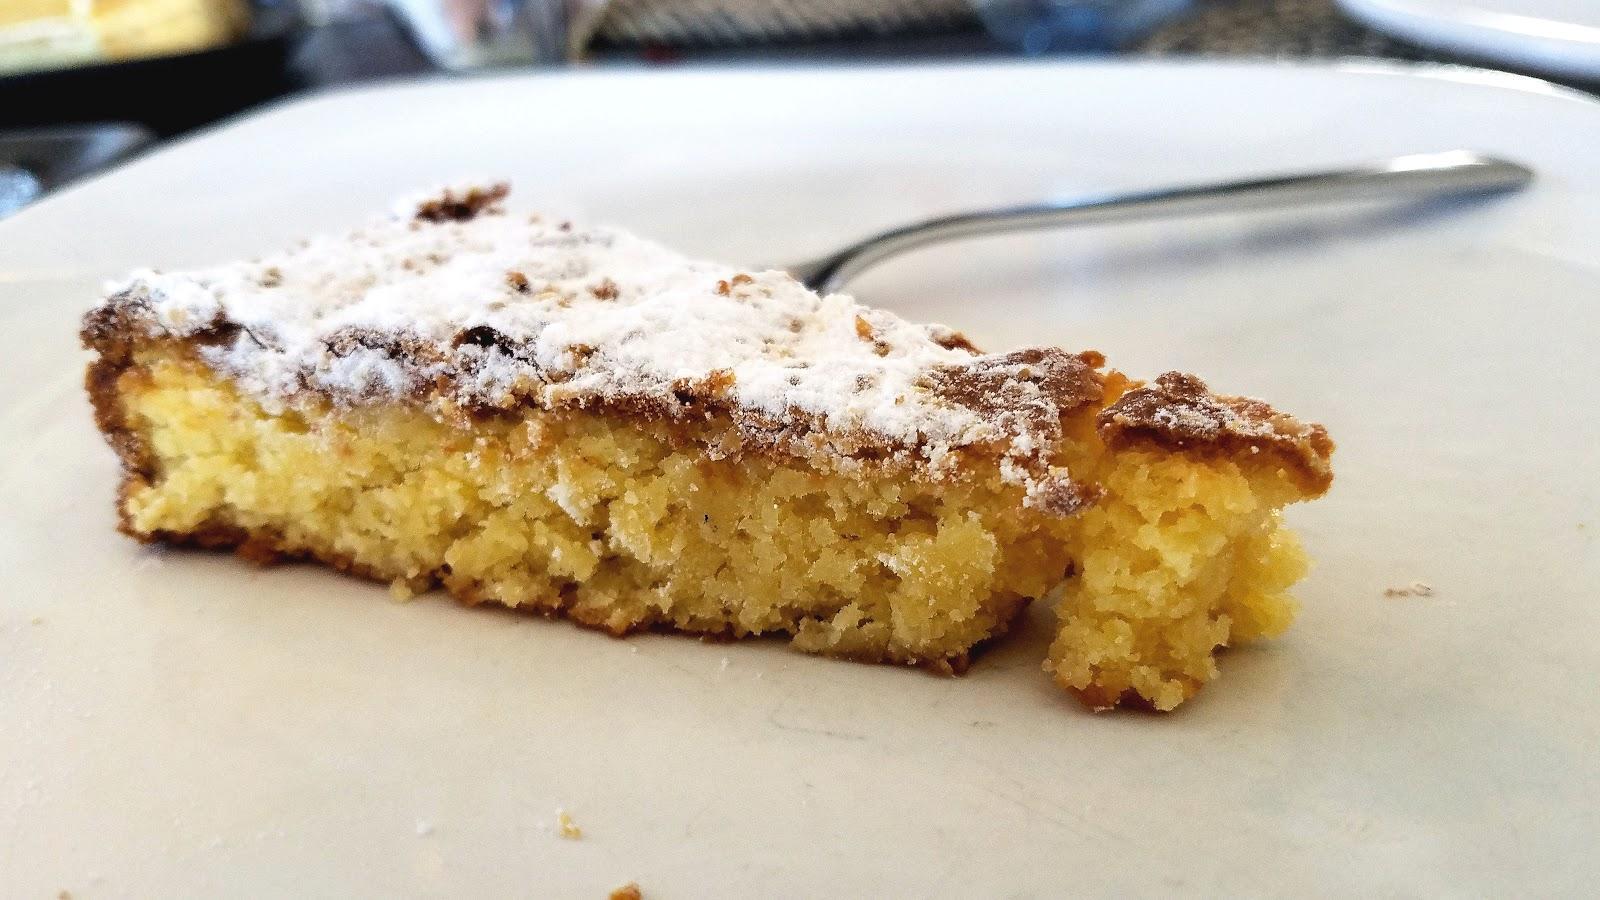 Of course for dessert, we had Tarta de Santiago!